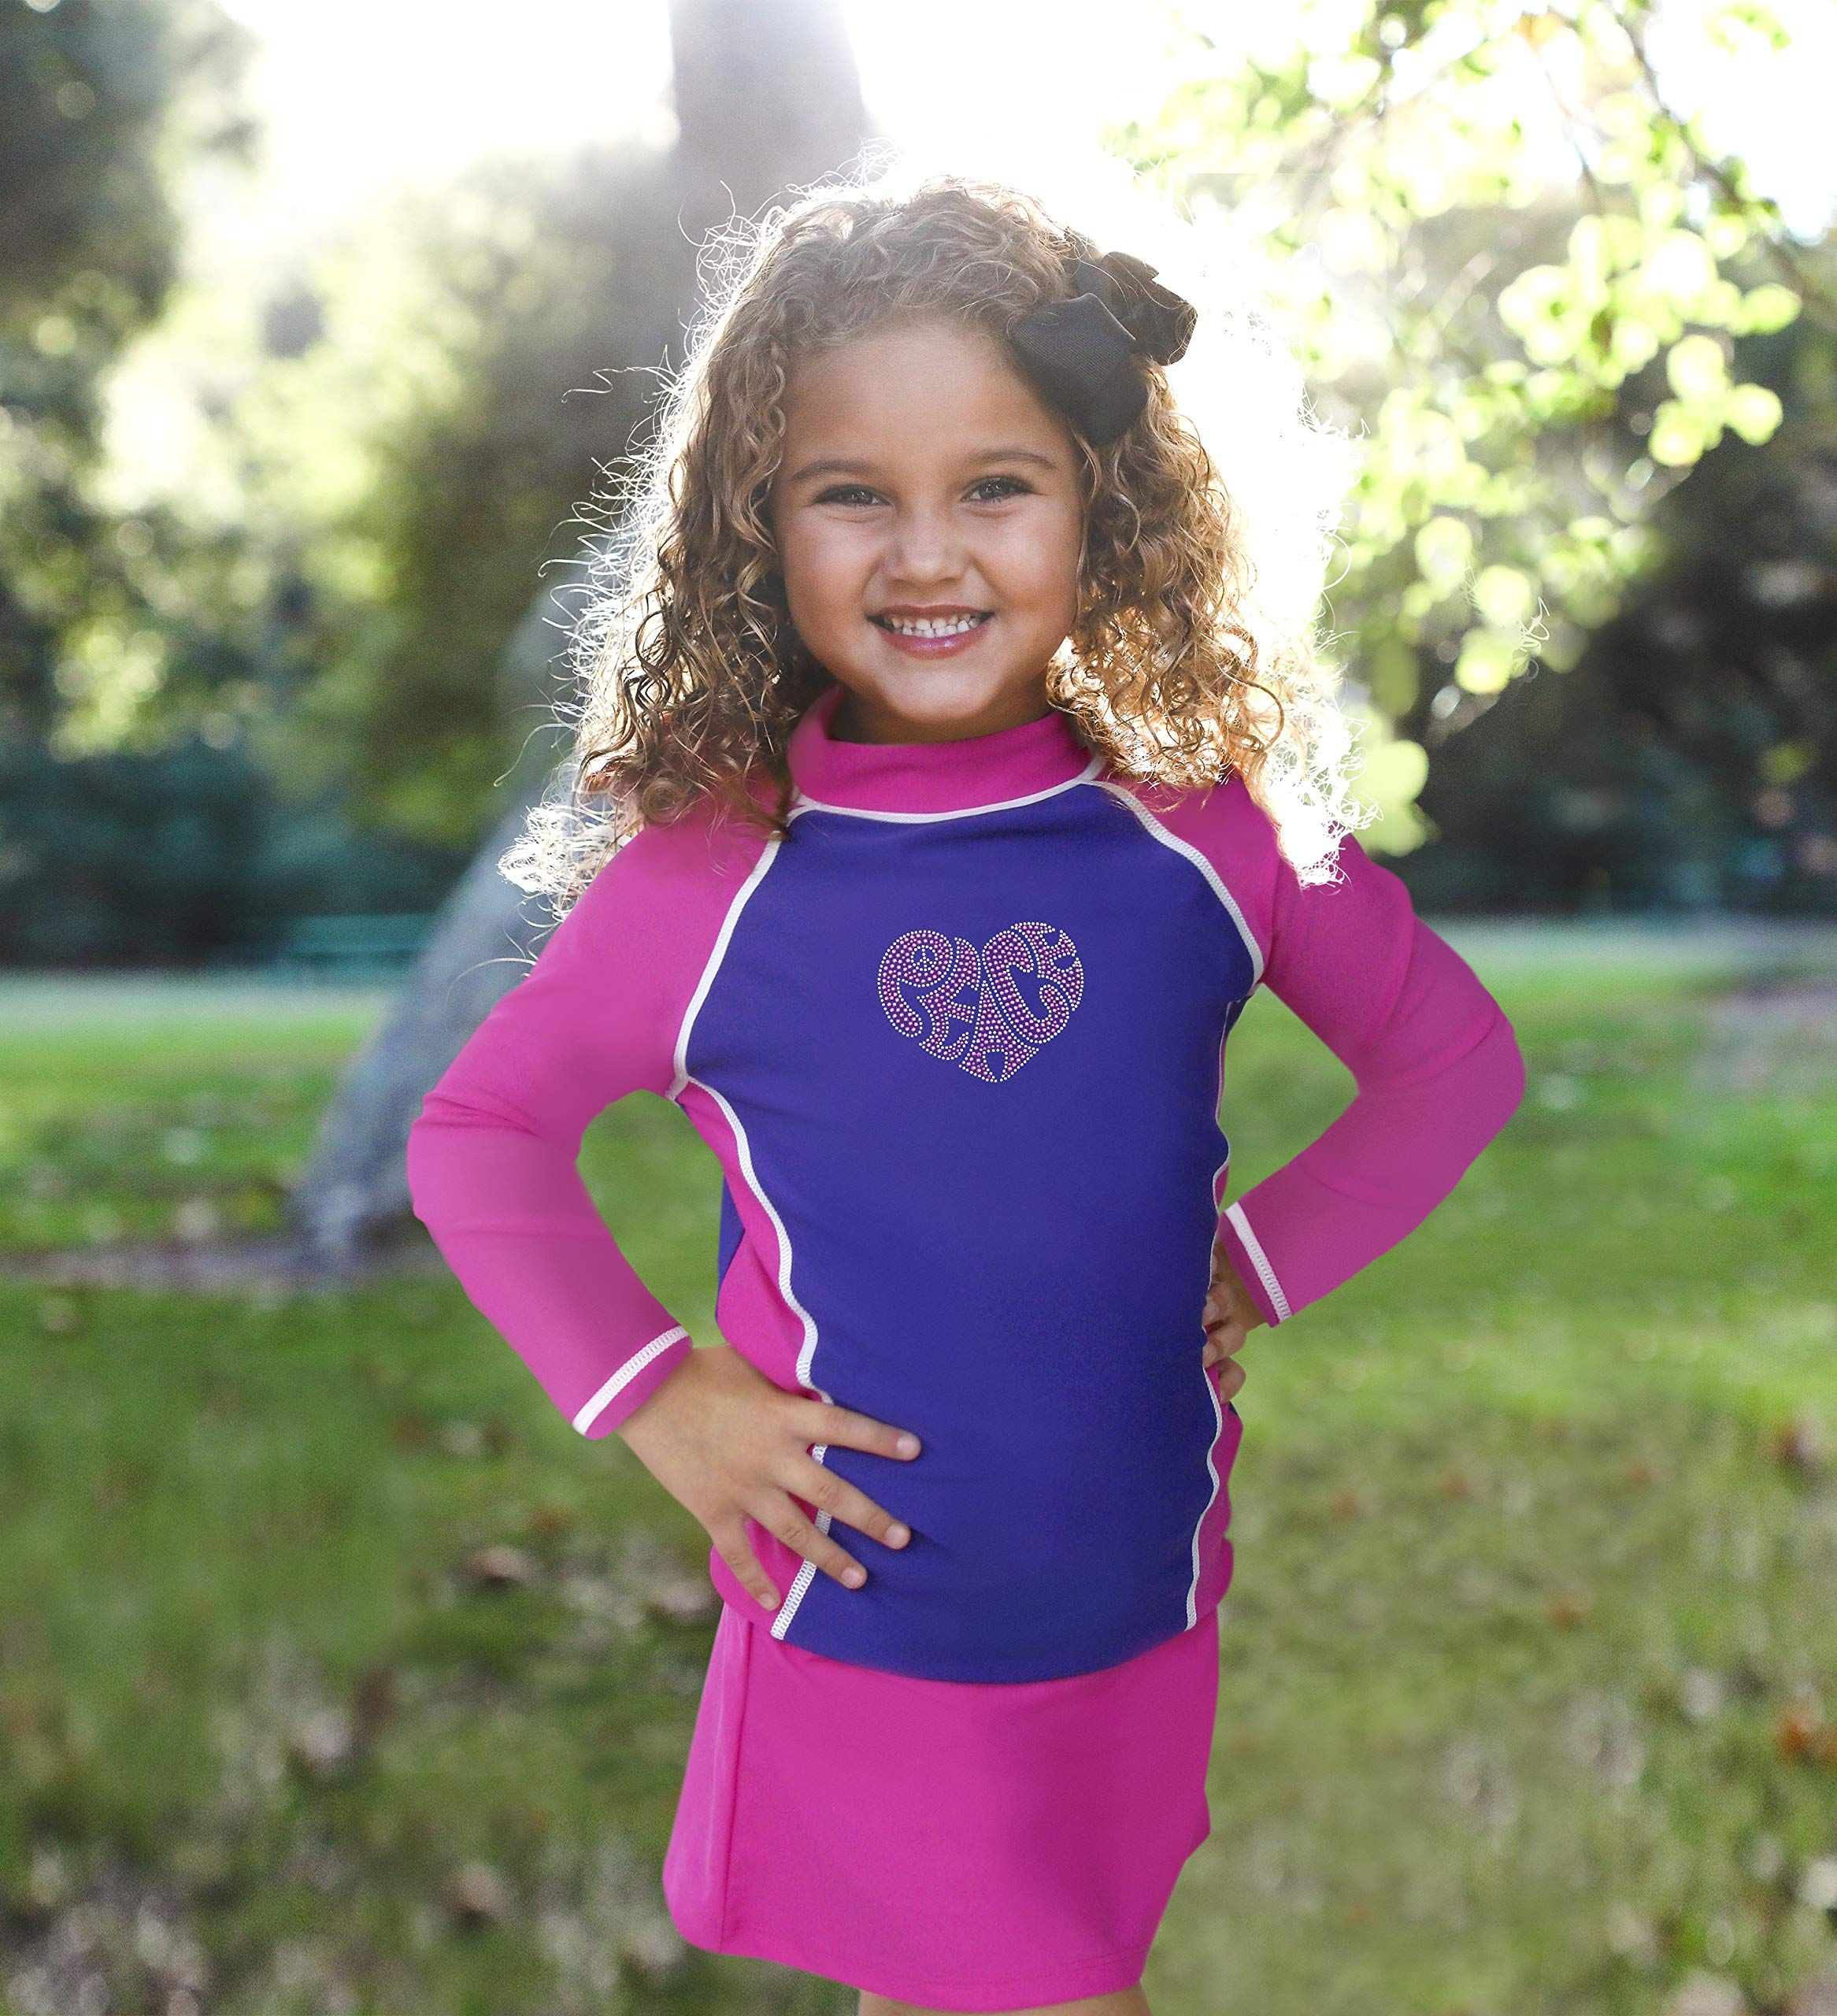 grUVywear Girls Long Sleeve Rashguard Bikini Skirt Set Sun Protection Swimsuit